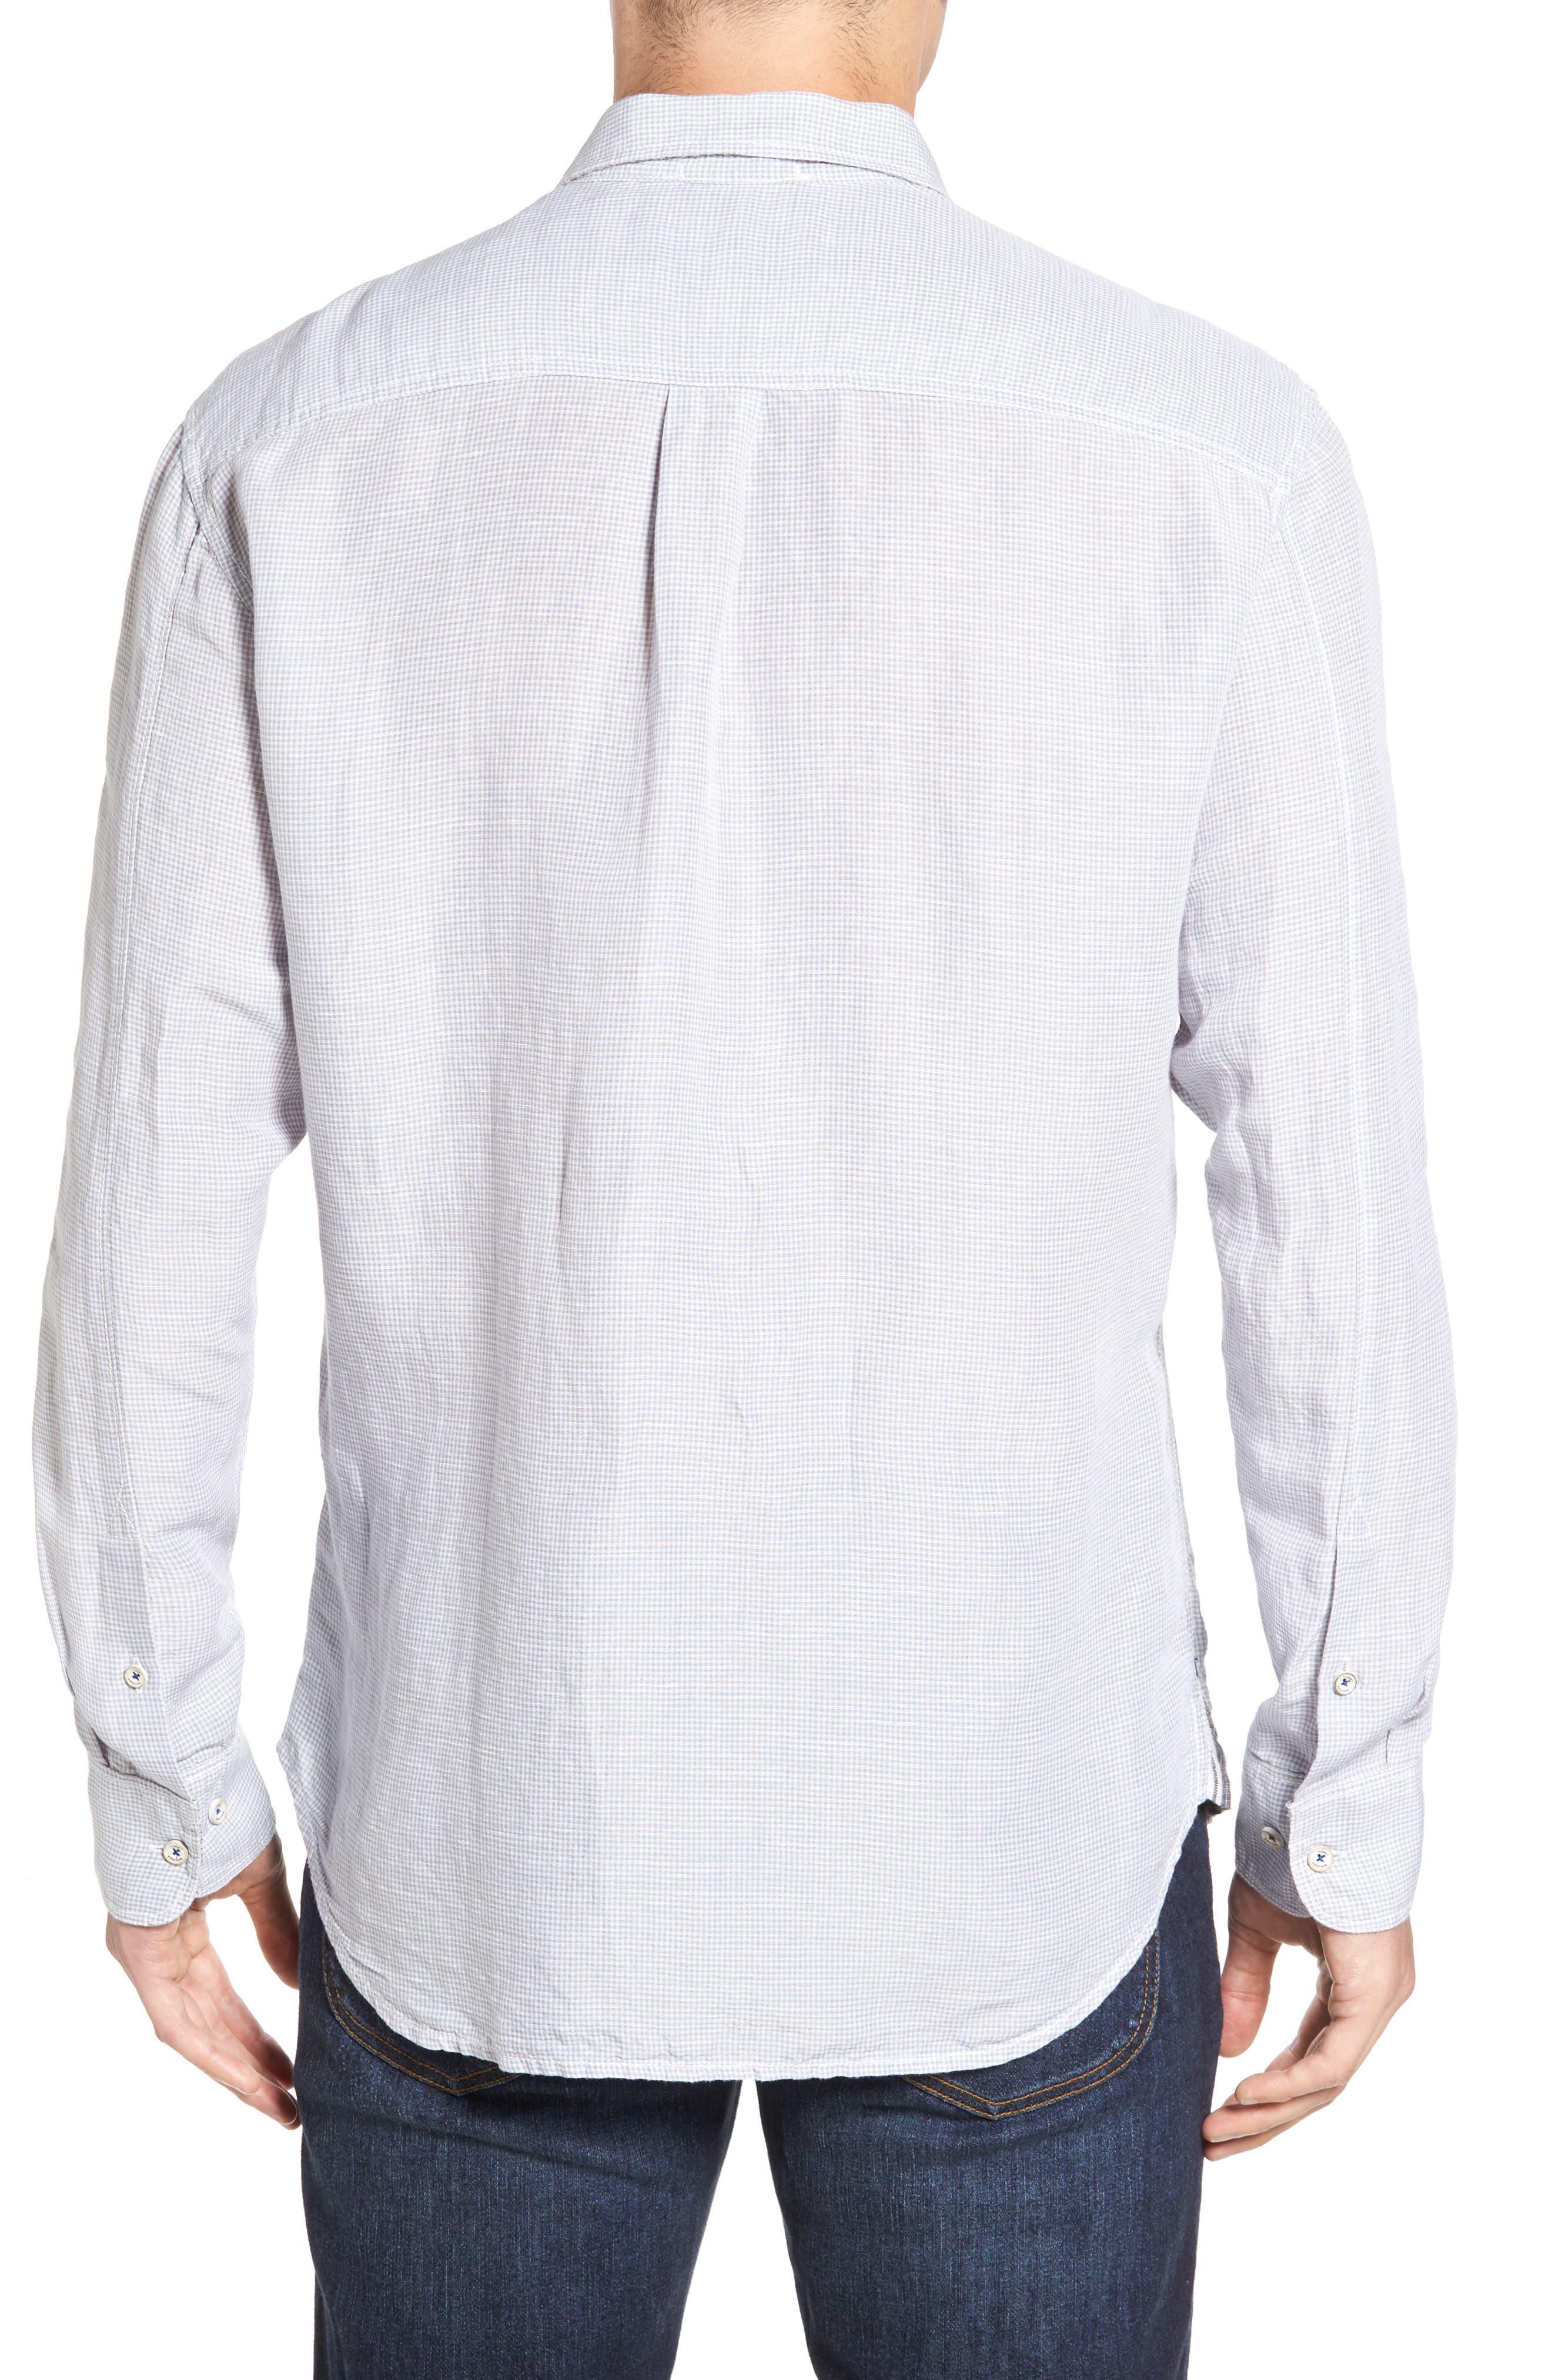 Sand Linen Island Modern Fit Sport Shirt,                             Alternate thumbnail 2, color,                             050